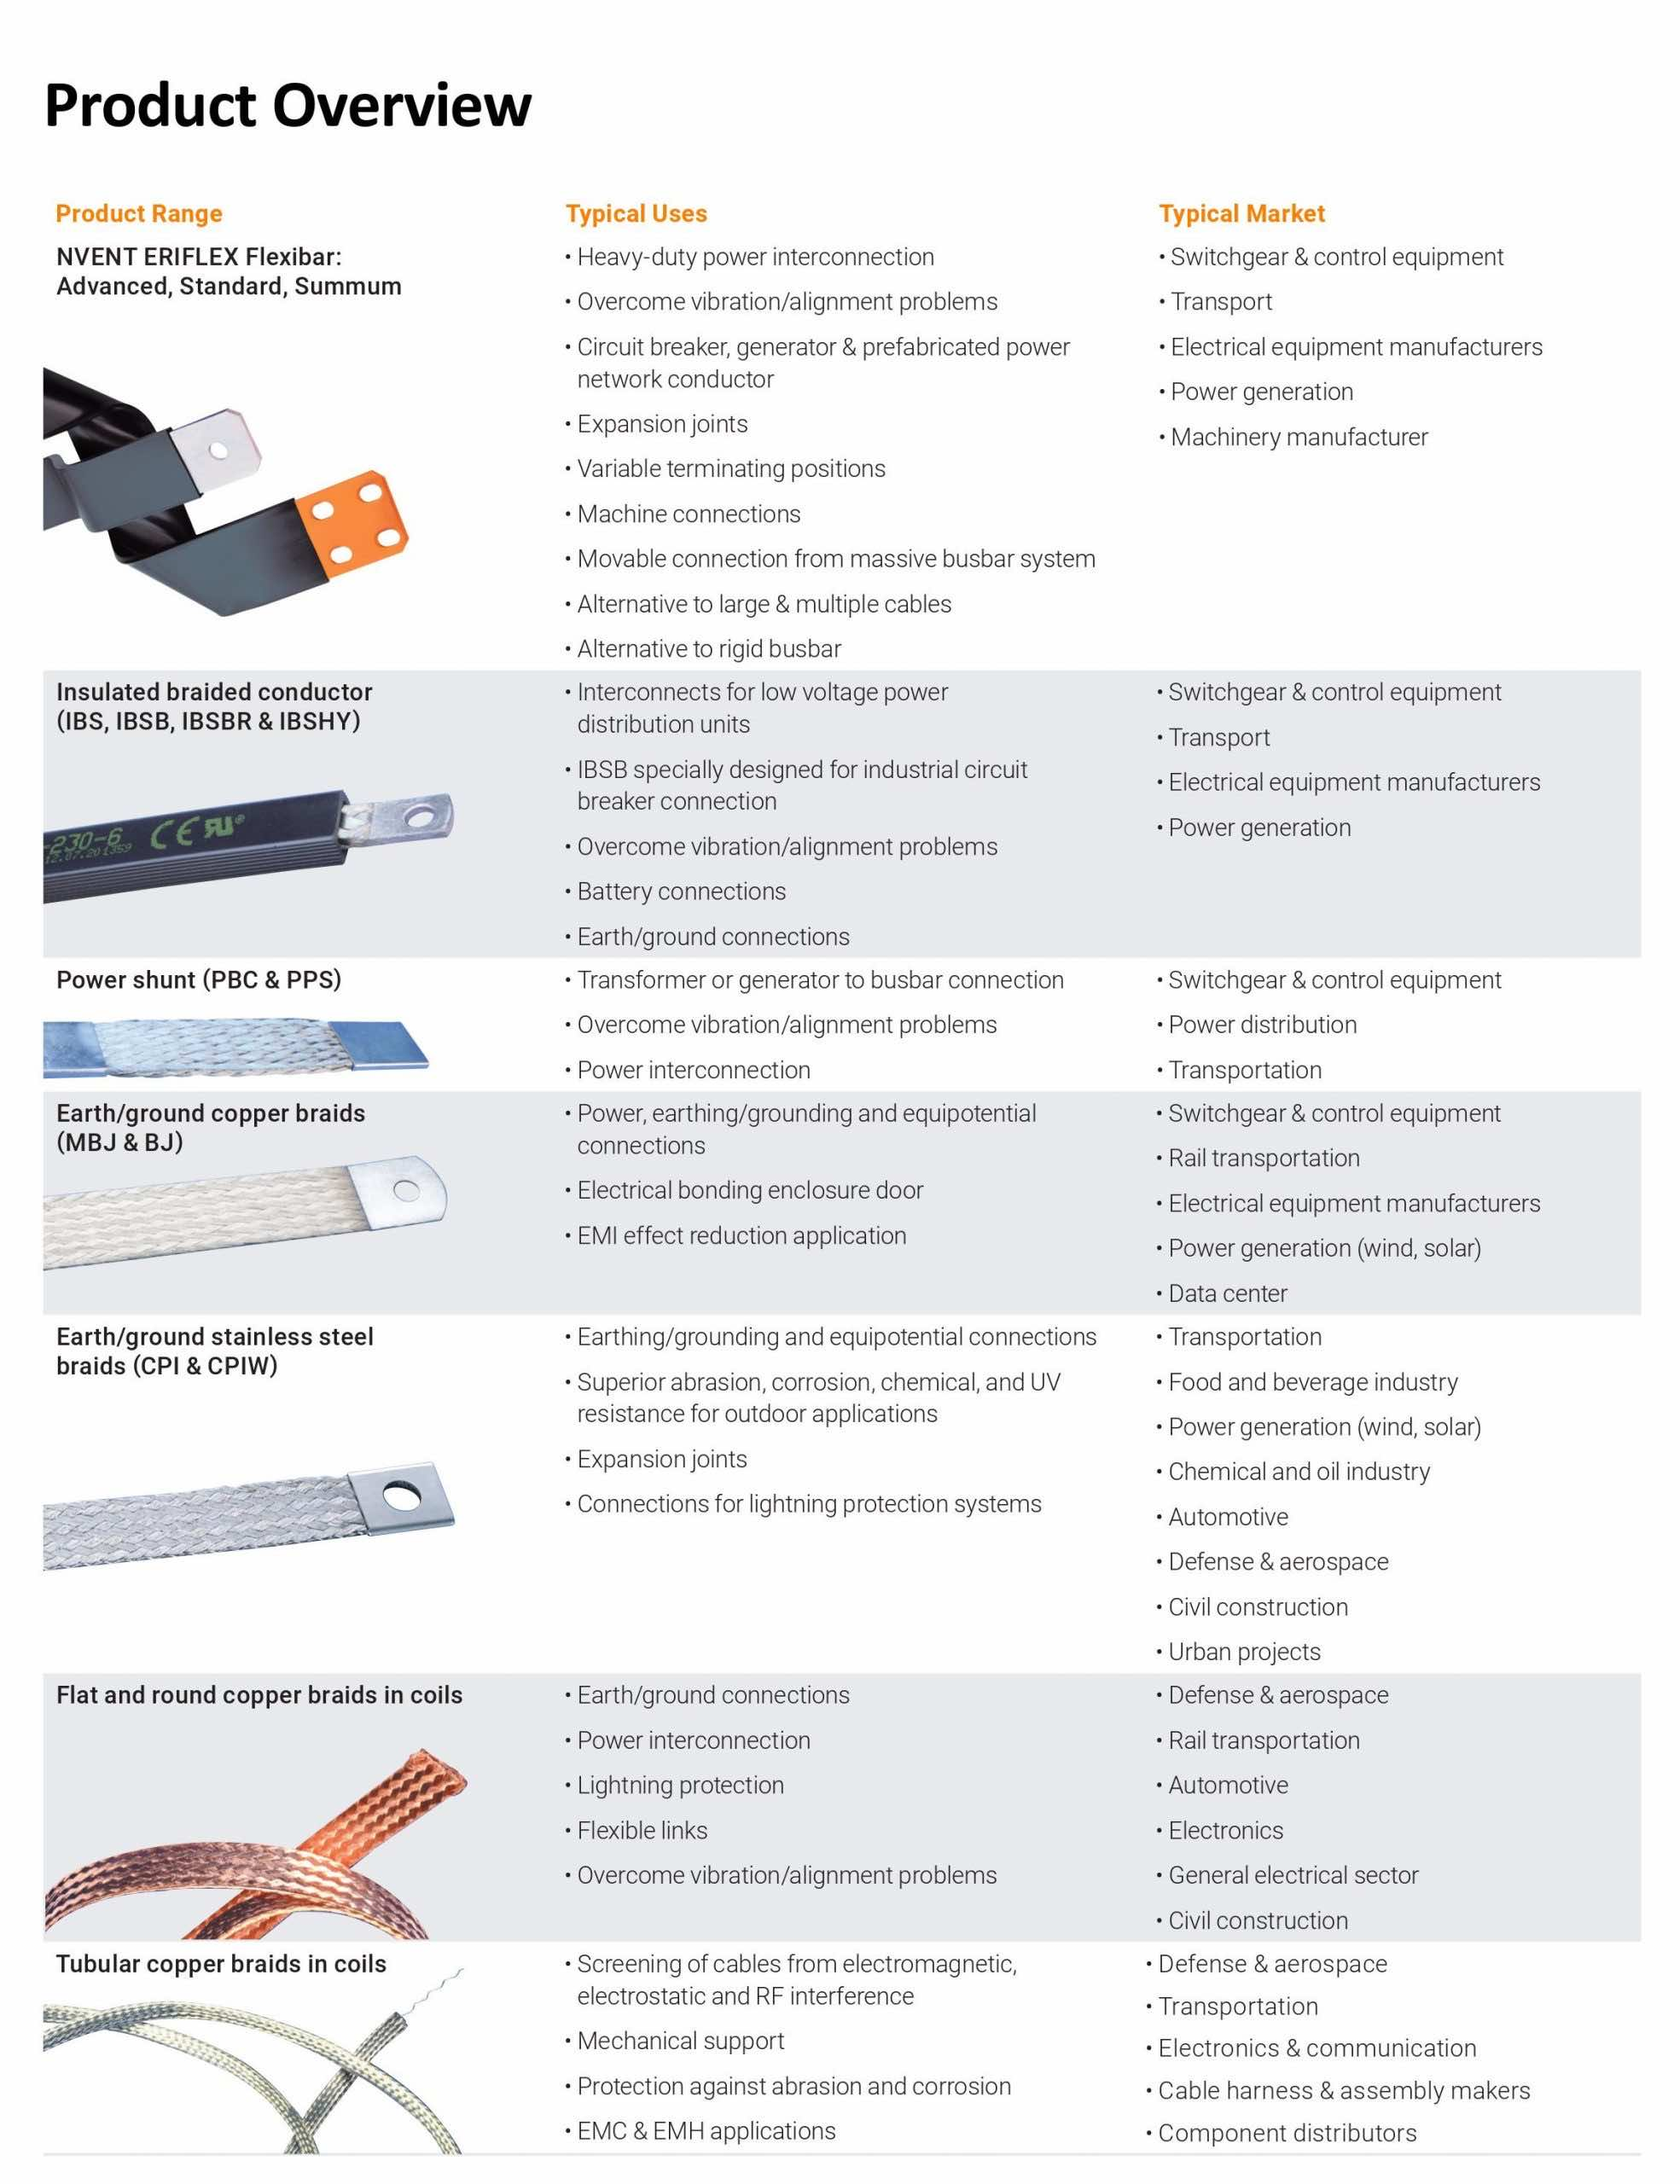 Low Voltage Flexible Conductors & Busbars - Product Range